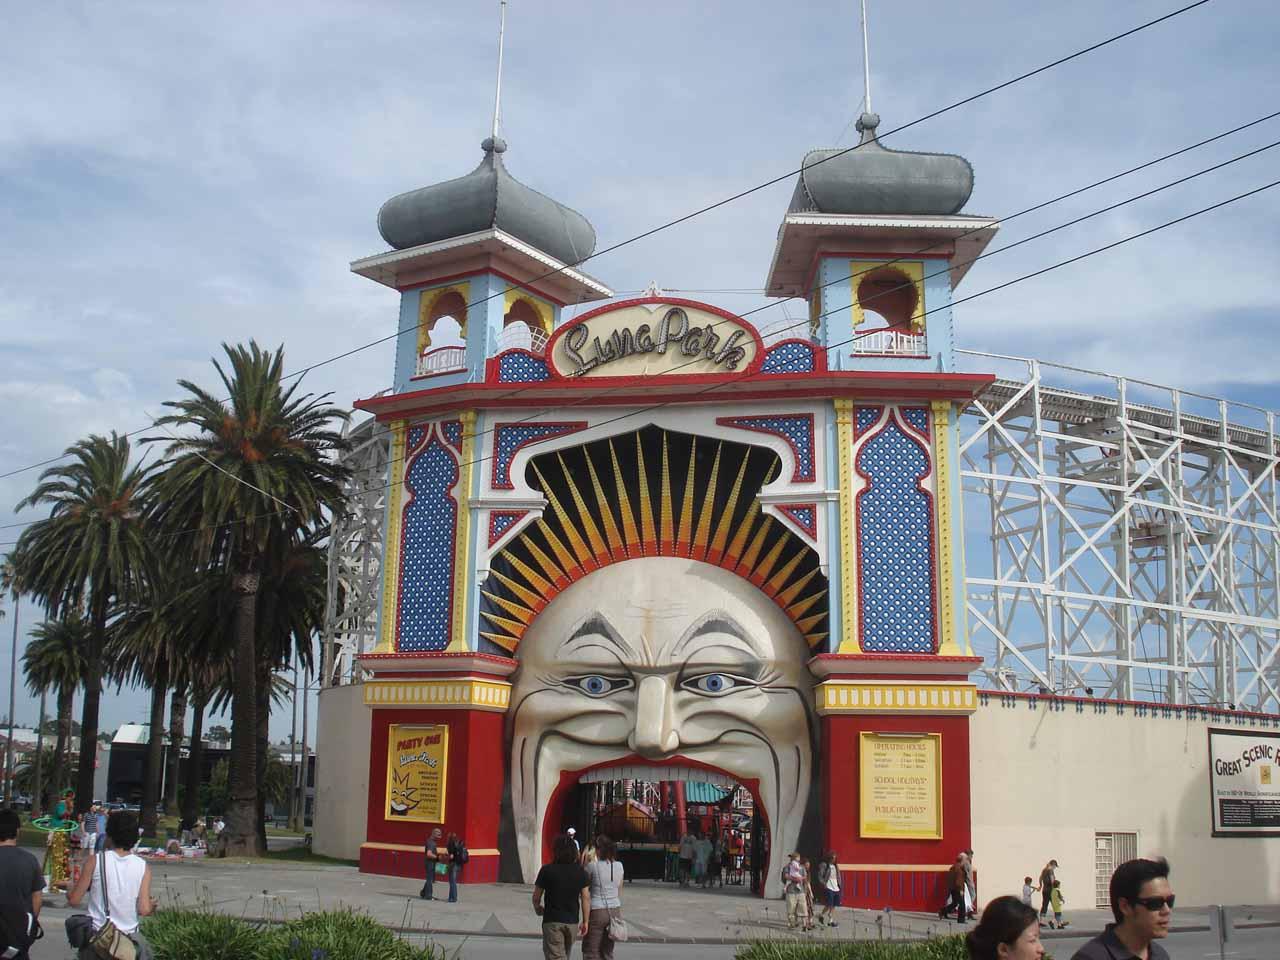 Some amusement park around St Kilda